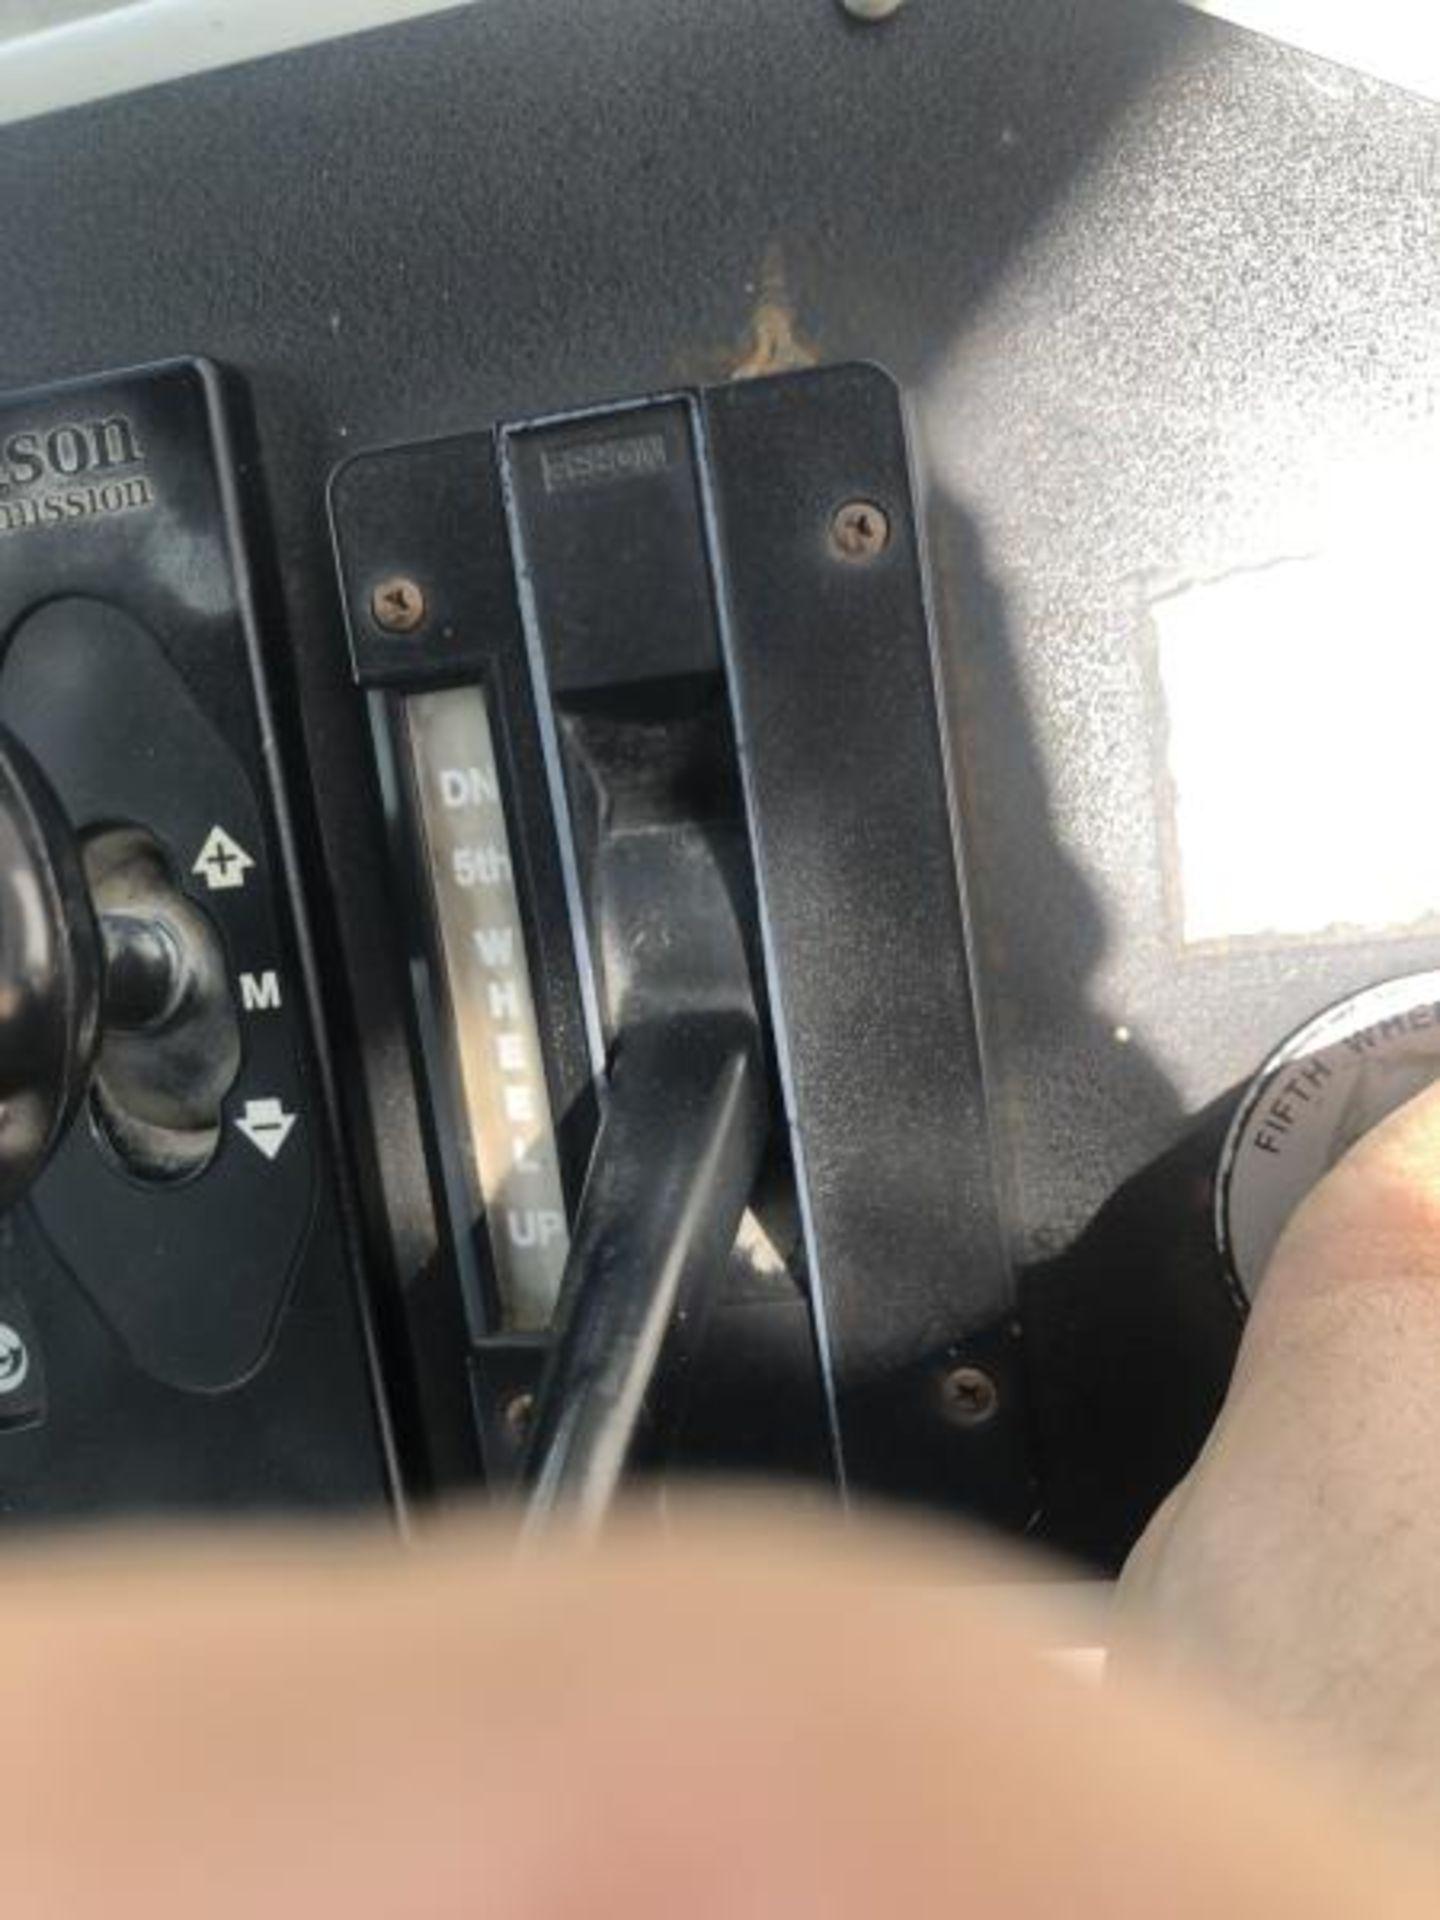 2015 Kalmar Ottawa 4x2 Yard Truck , SN: 338845 2,600.5 Hours, 185 Miles - Image 26 of 27